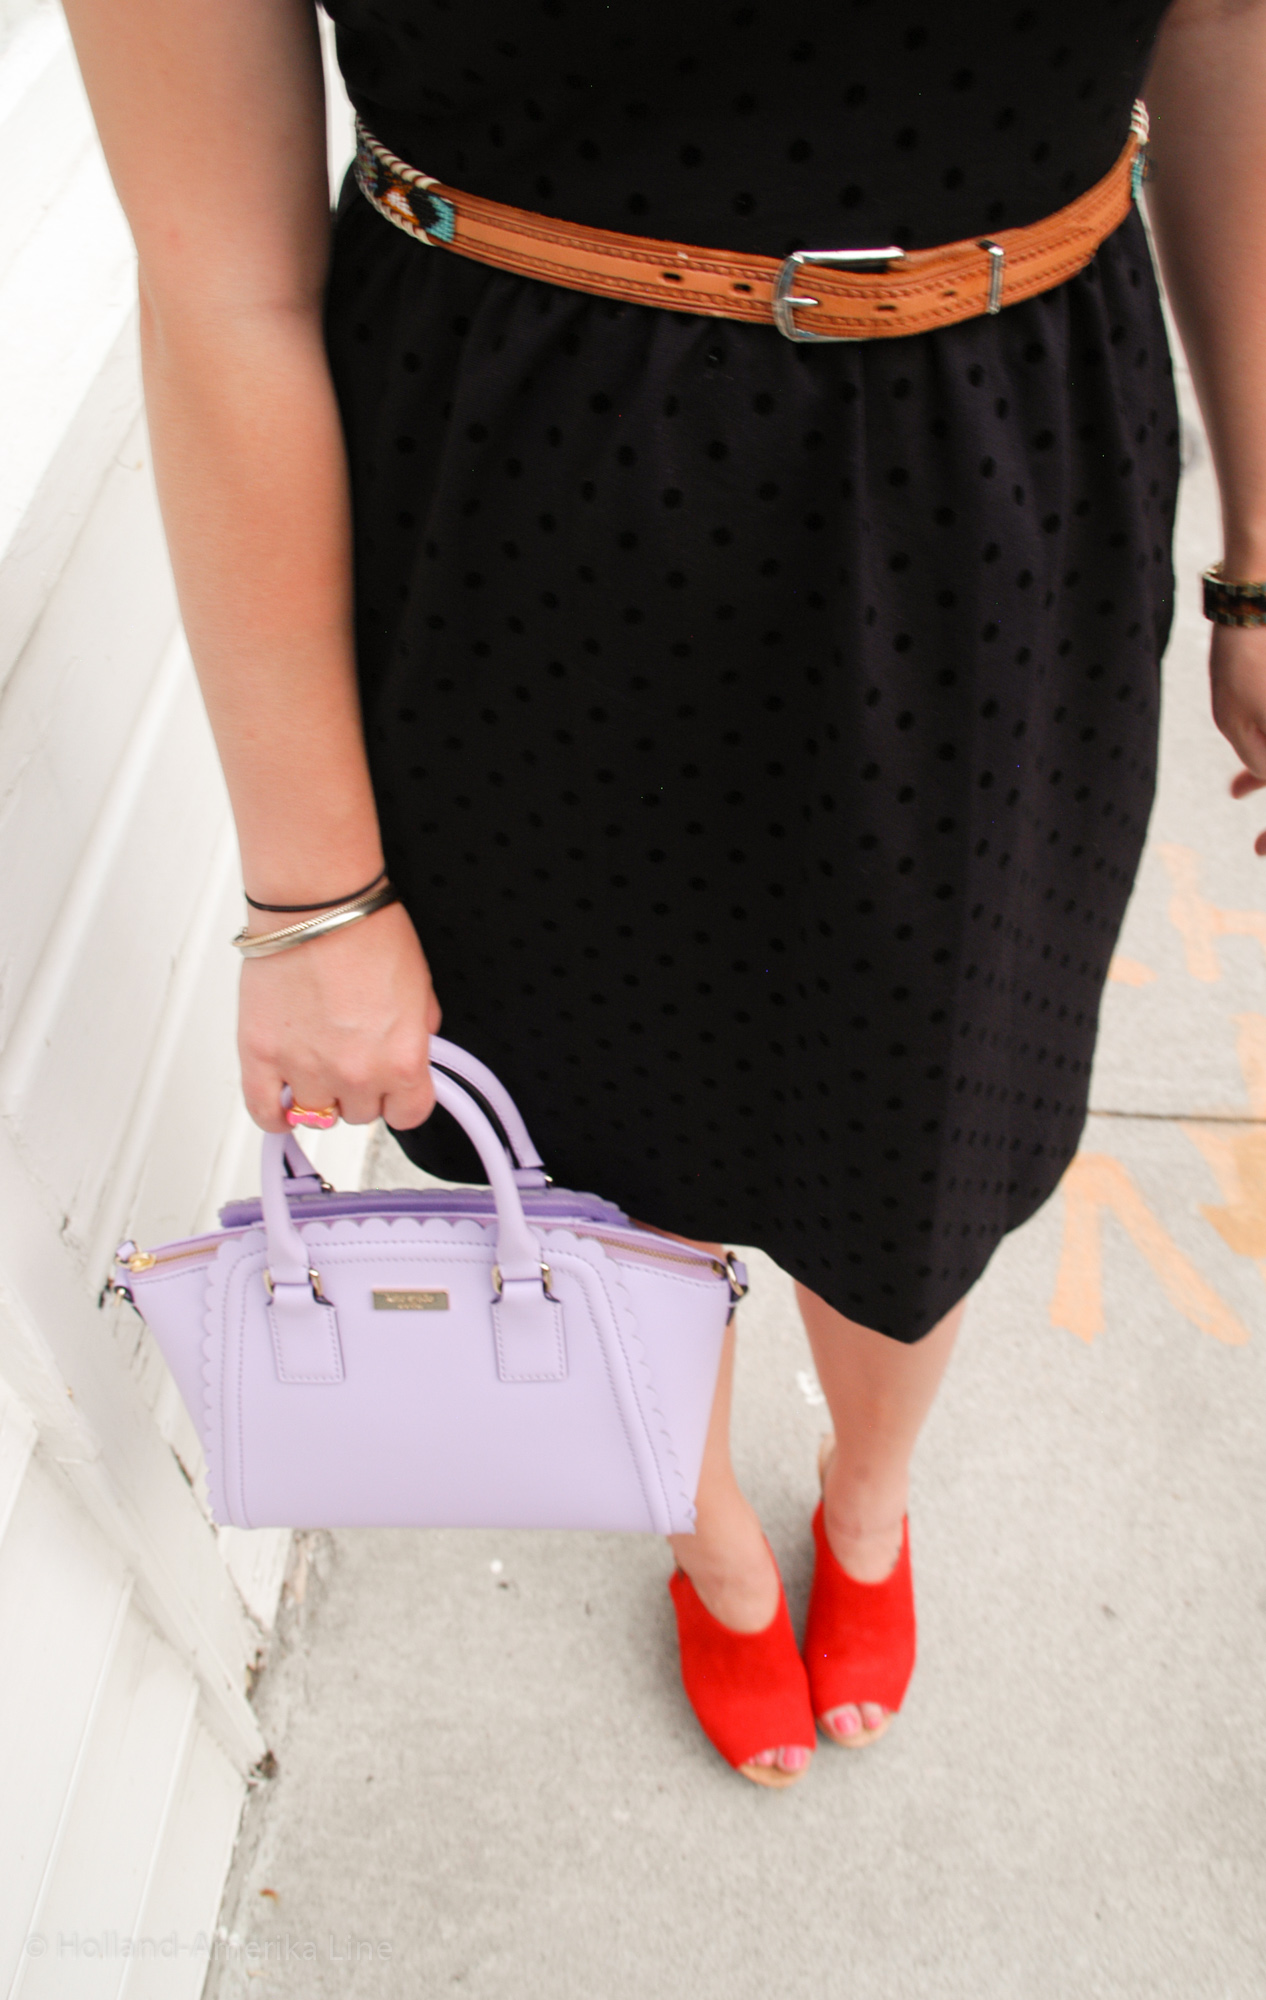 Dress: J.Crew | Belt: Vintage | Shoes: Payless | Bag: Kate Spade (marguerite) | Glasses: Ray Ban via Sunglass Hut